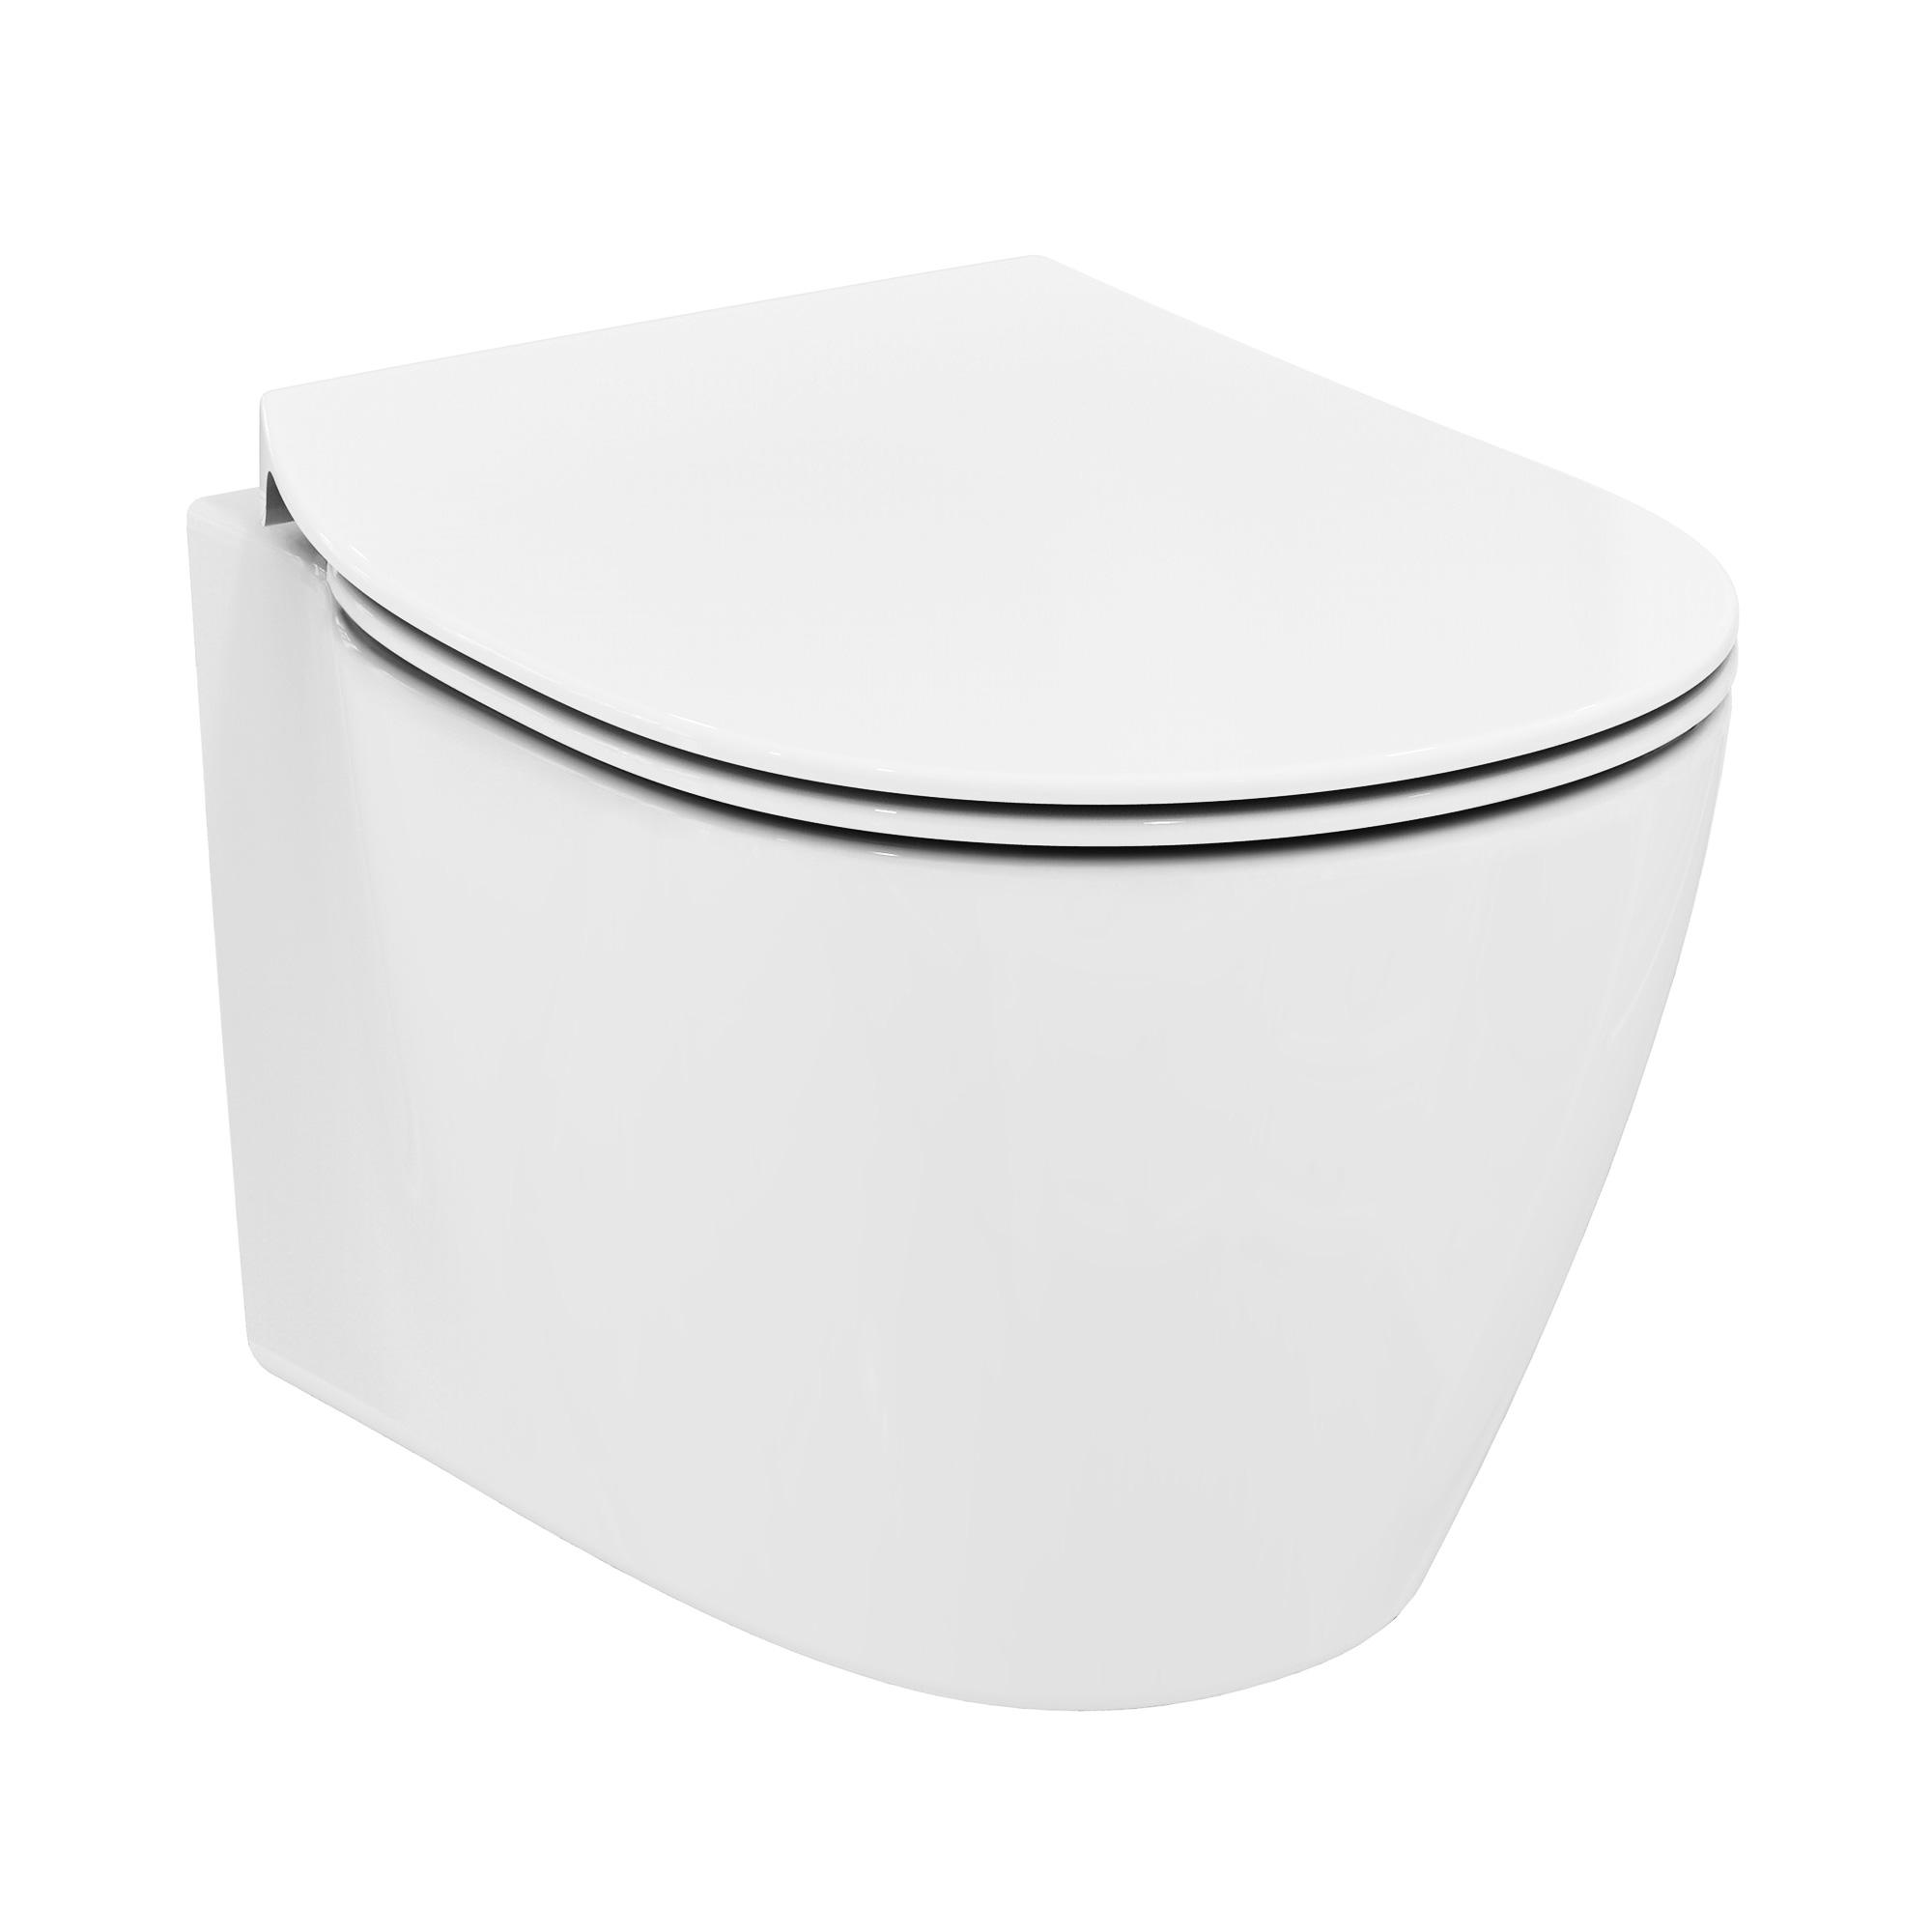 ideal standard connect space wand wc kompakt unsichtbare befestigung wei mit ideal plus. Black Bedroom Furniture Sets. Home Design Ideas